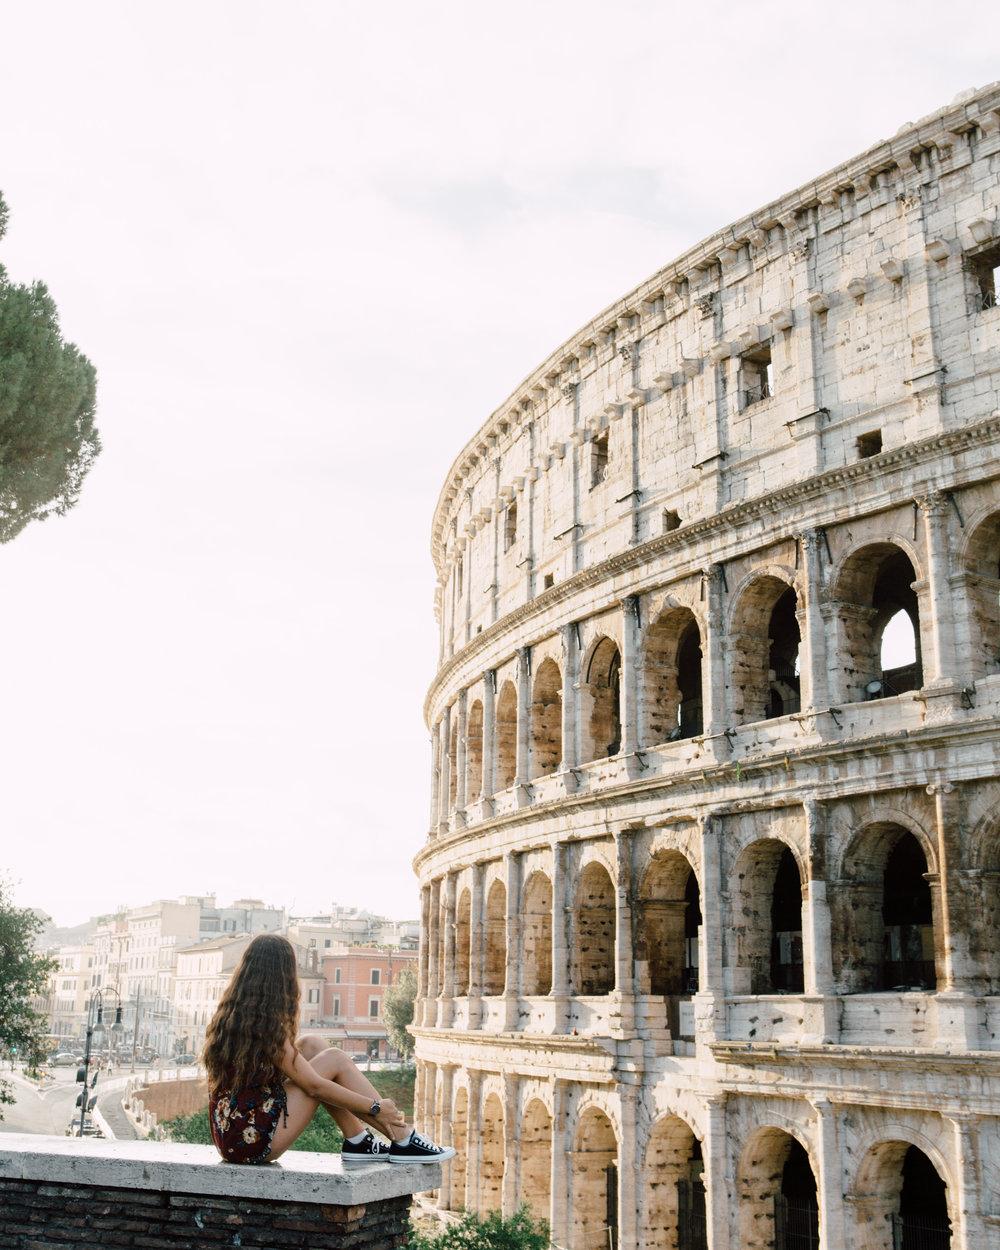 Colesseum, Rome, Italy-8346.jpg